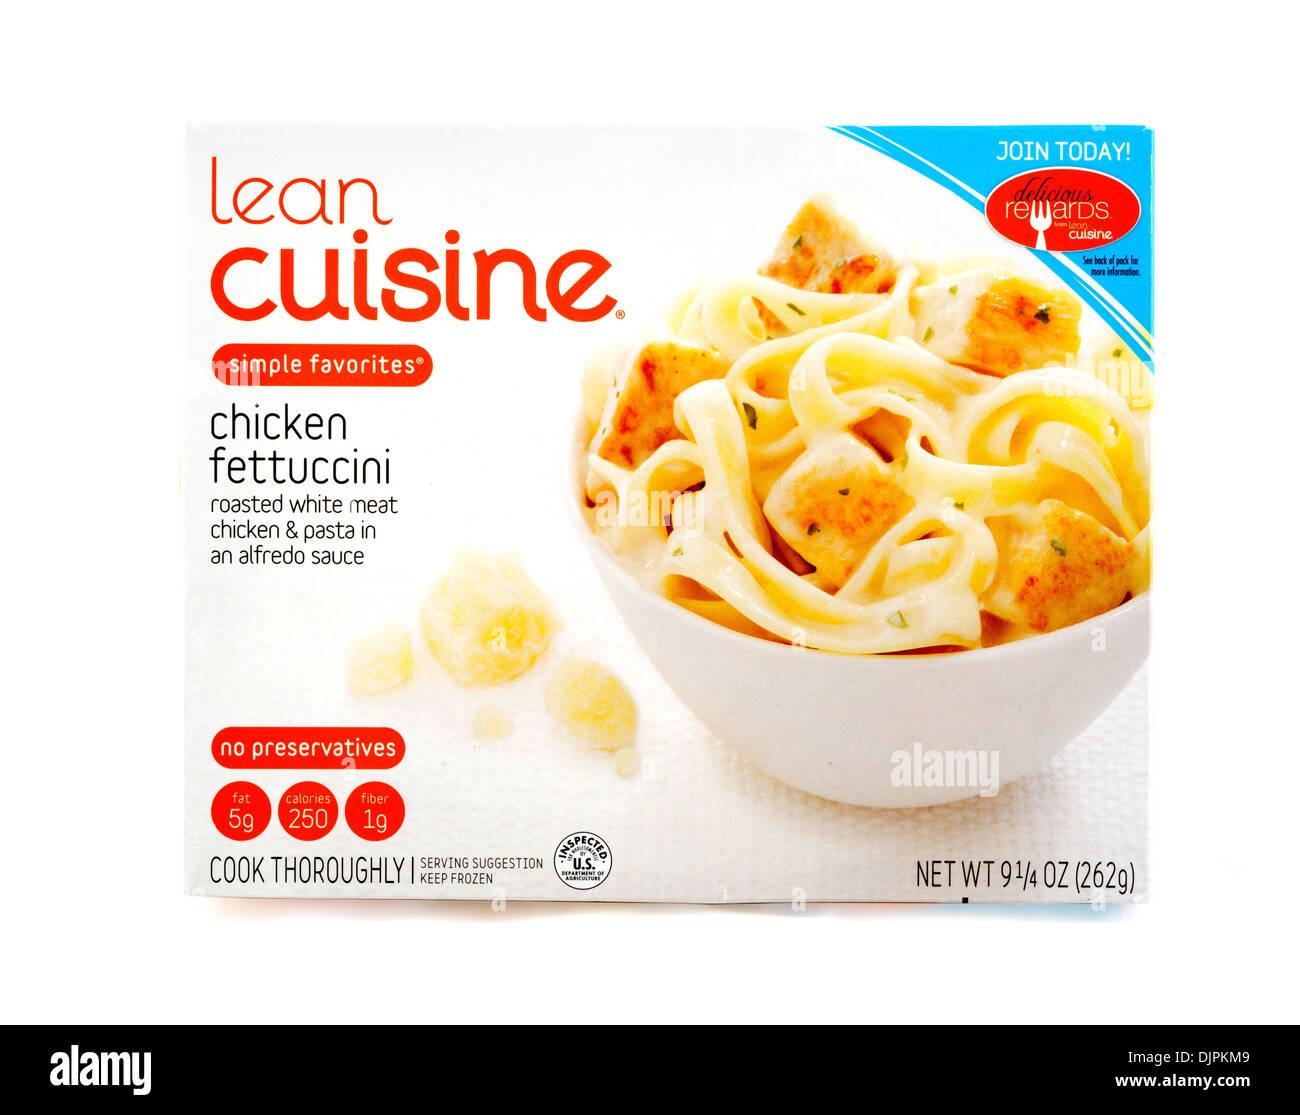 Lean Cuisine Chicken Fettucini low calorie frozen ready meal, USA - Stock Image